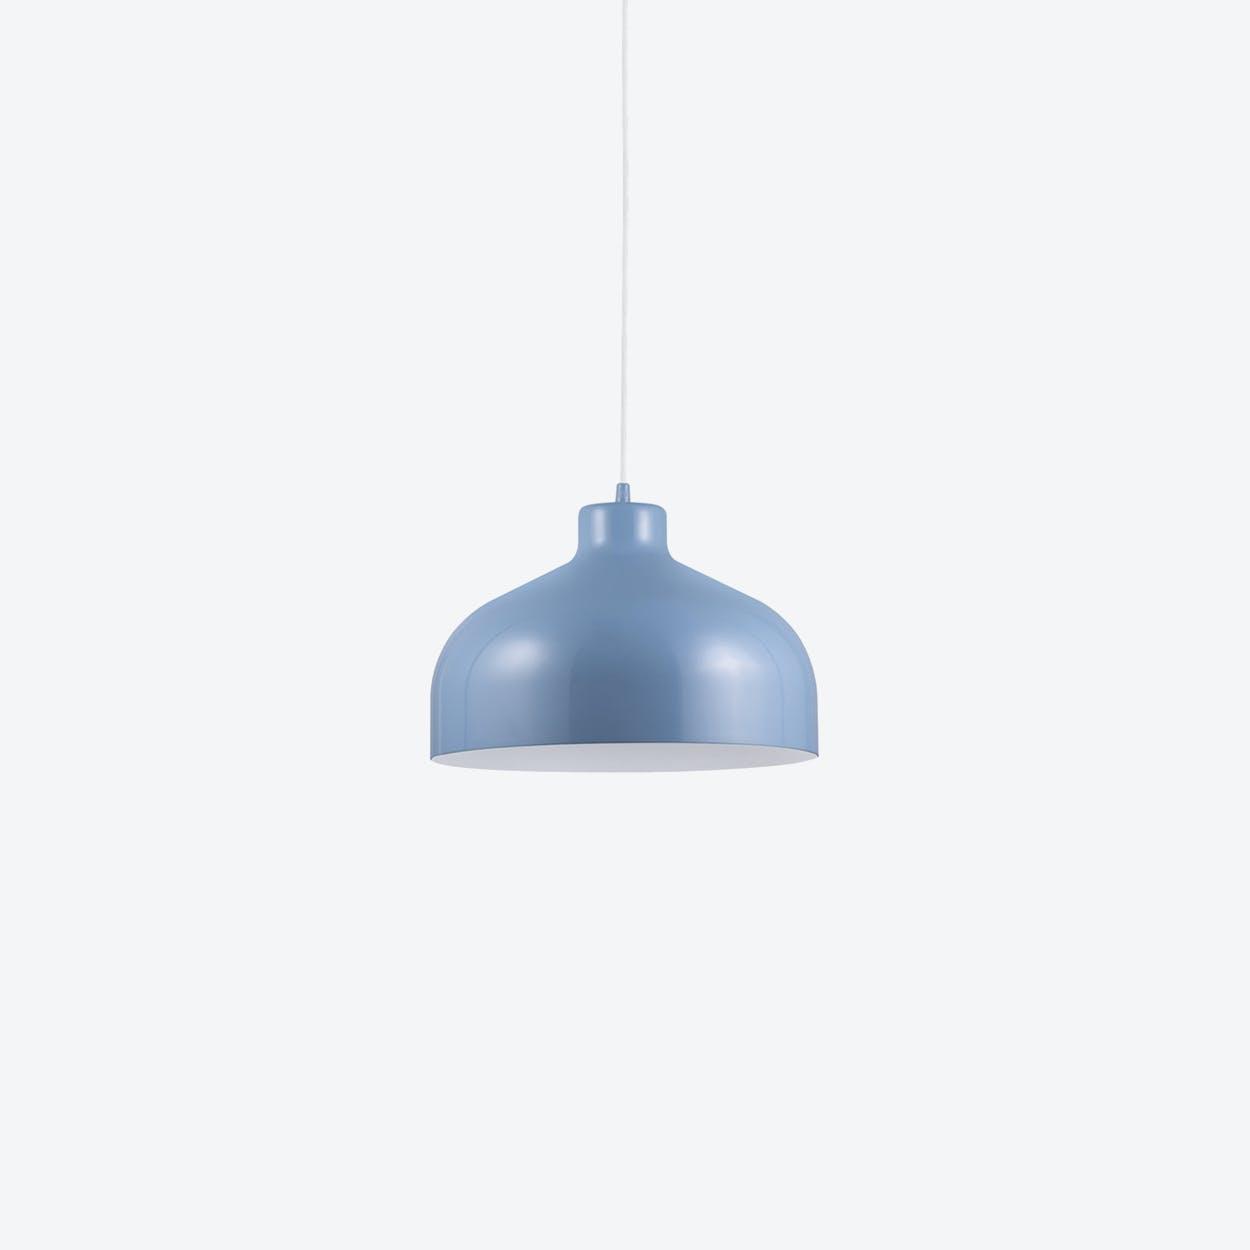 B&B Pendant Lamp in Blue